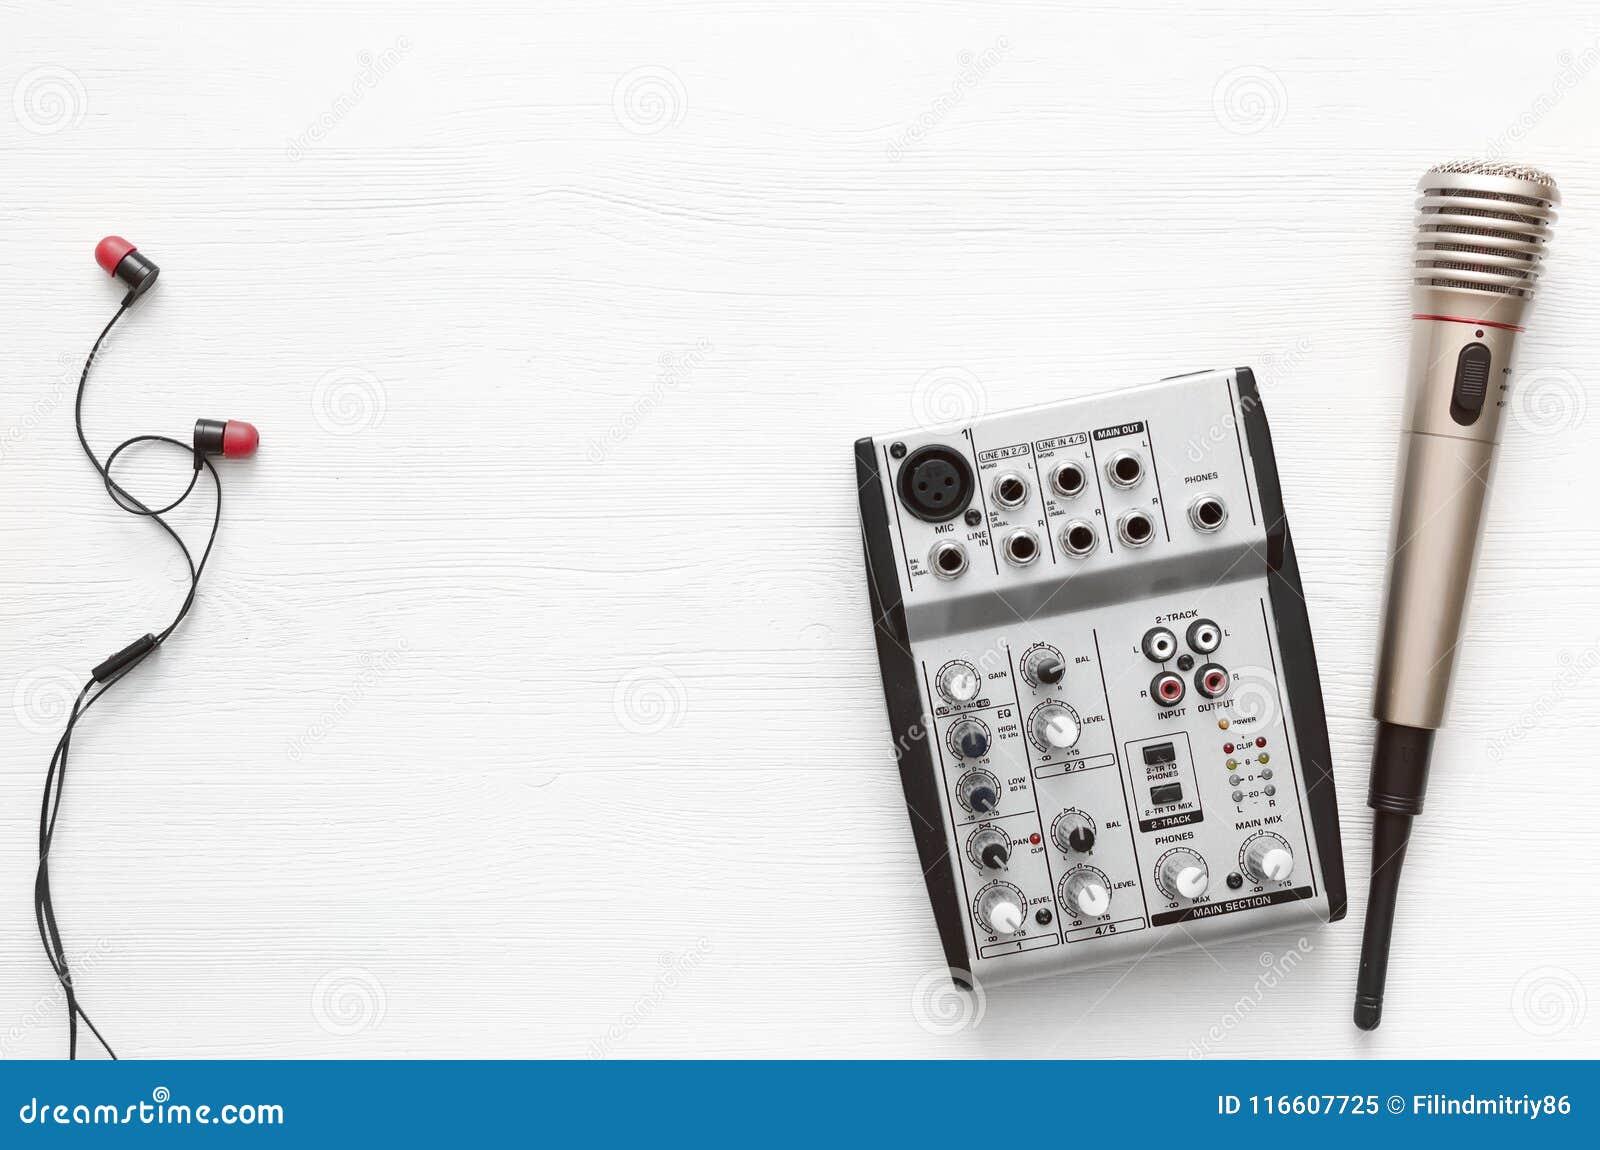 Karaoke Singer Microphone Sound Recording Studio Background Song Wiring Lyrics Copy Space